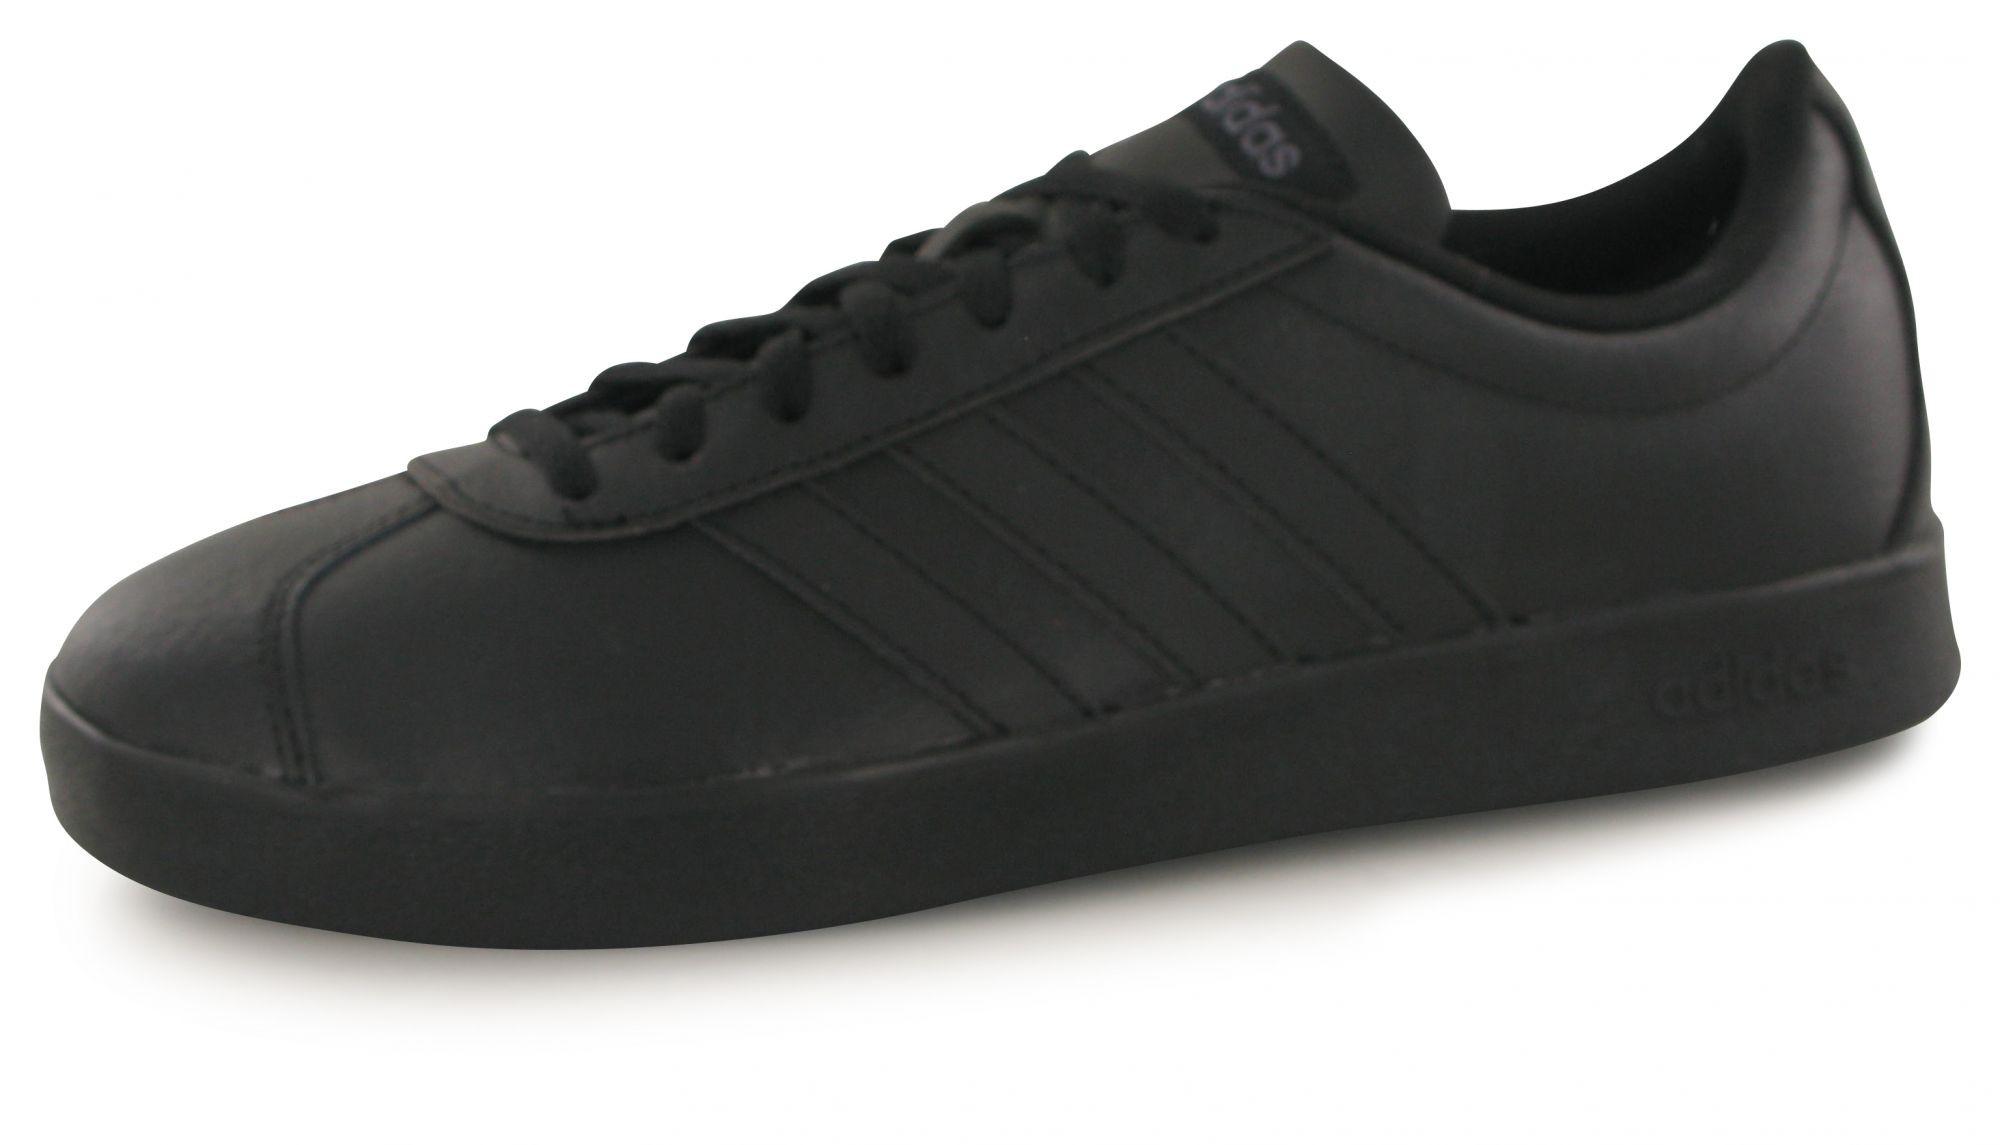 best website 9bf36 2fad0 Adidas Scarpe Sneakers Sportive Ginnastica Nero vl court 2.0 gazelle style  5 5 di 8 ...